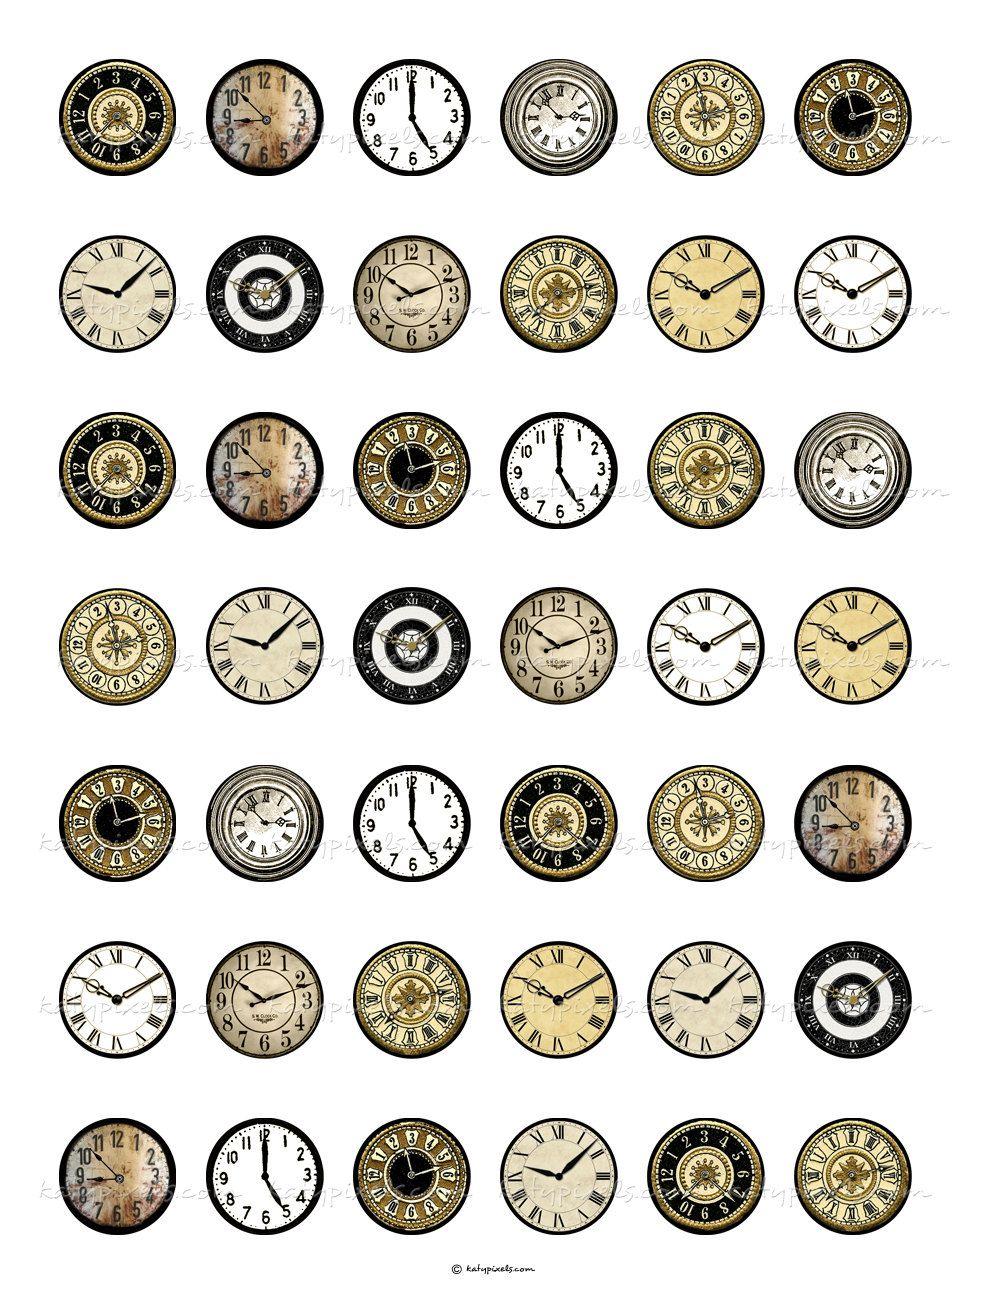 Vintage Clock Faces 1 inch Round Digital Collage ...